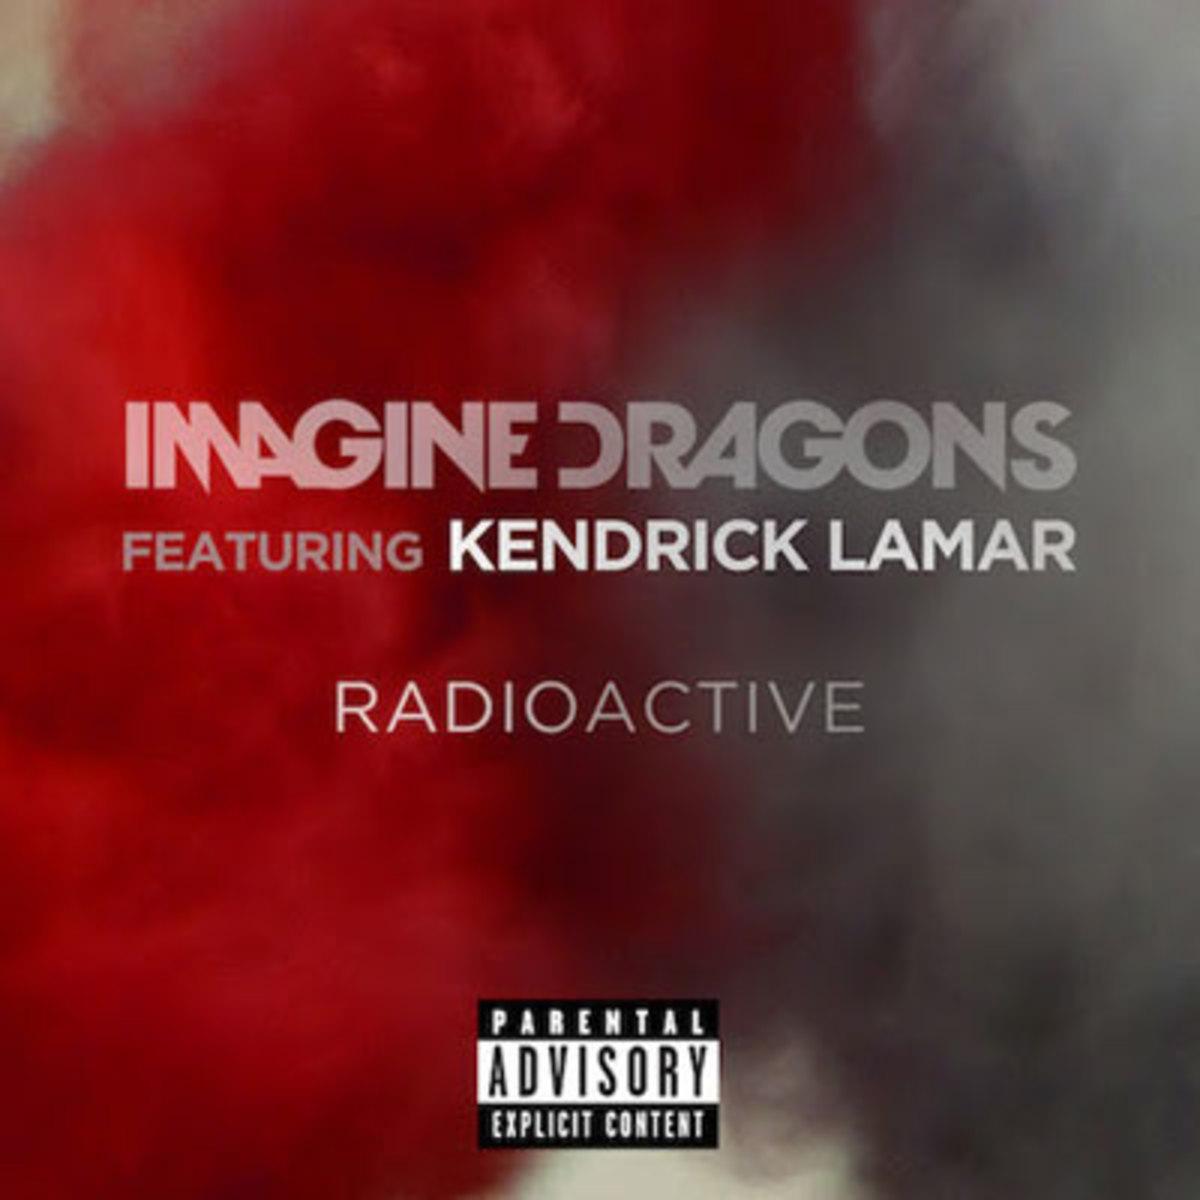 imaginedragons-radioactivermx.jpg